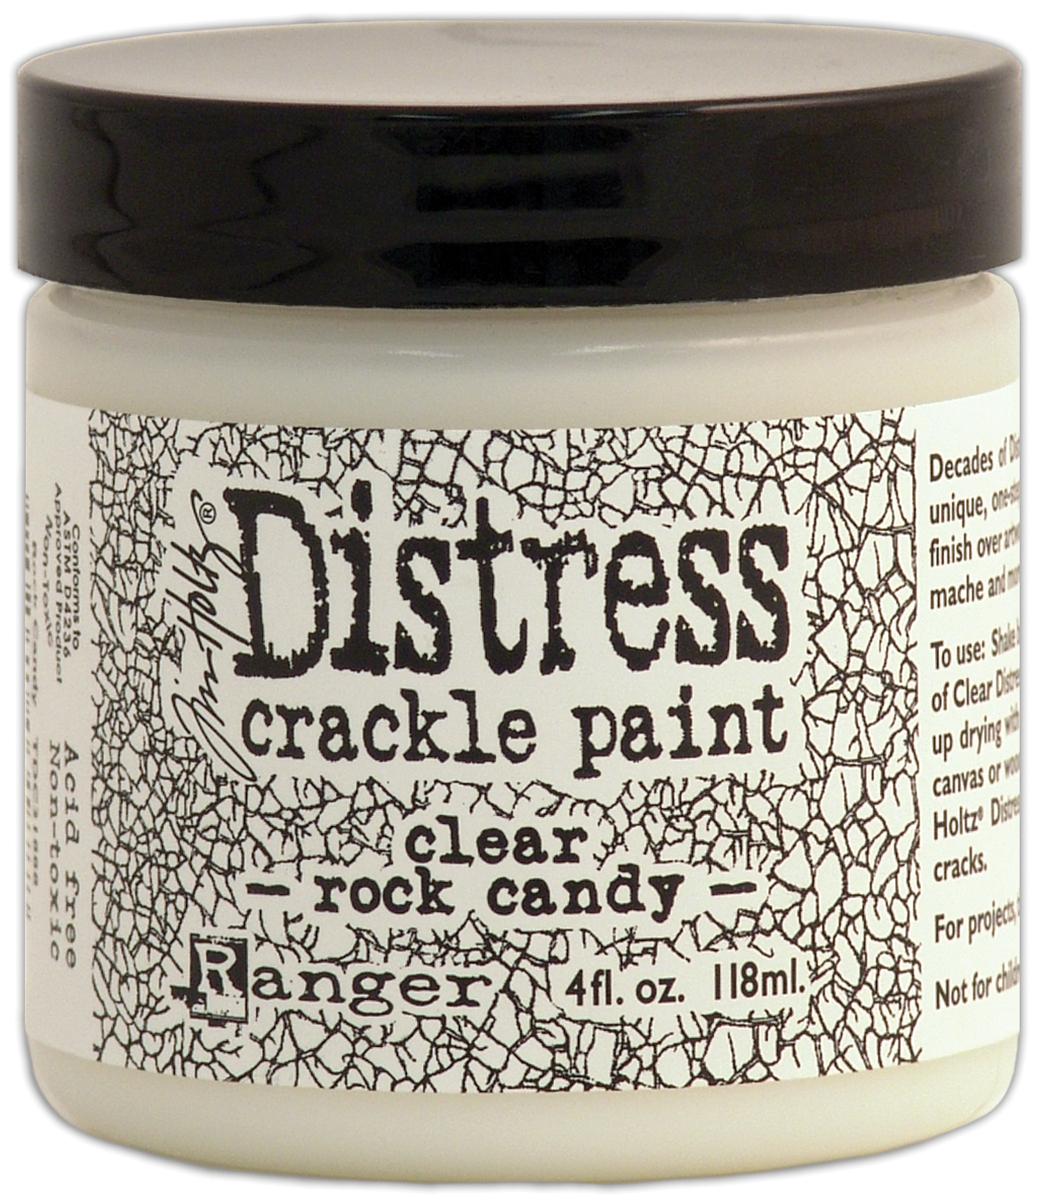 Tim Holtz - Distress Crackle Paint - Clear Rock Candy 4oz